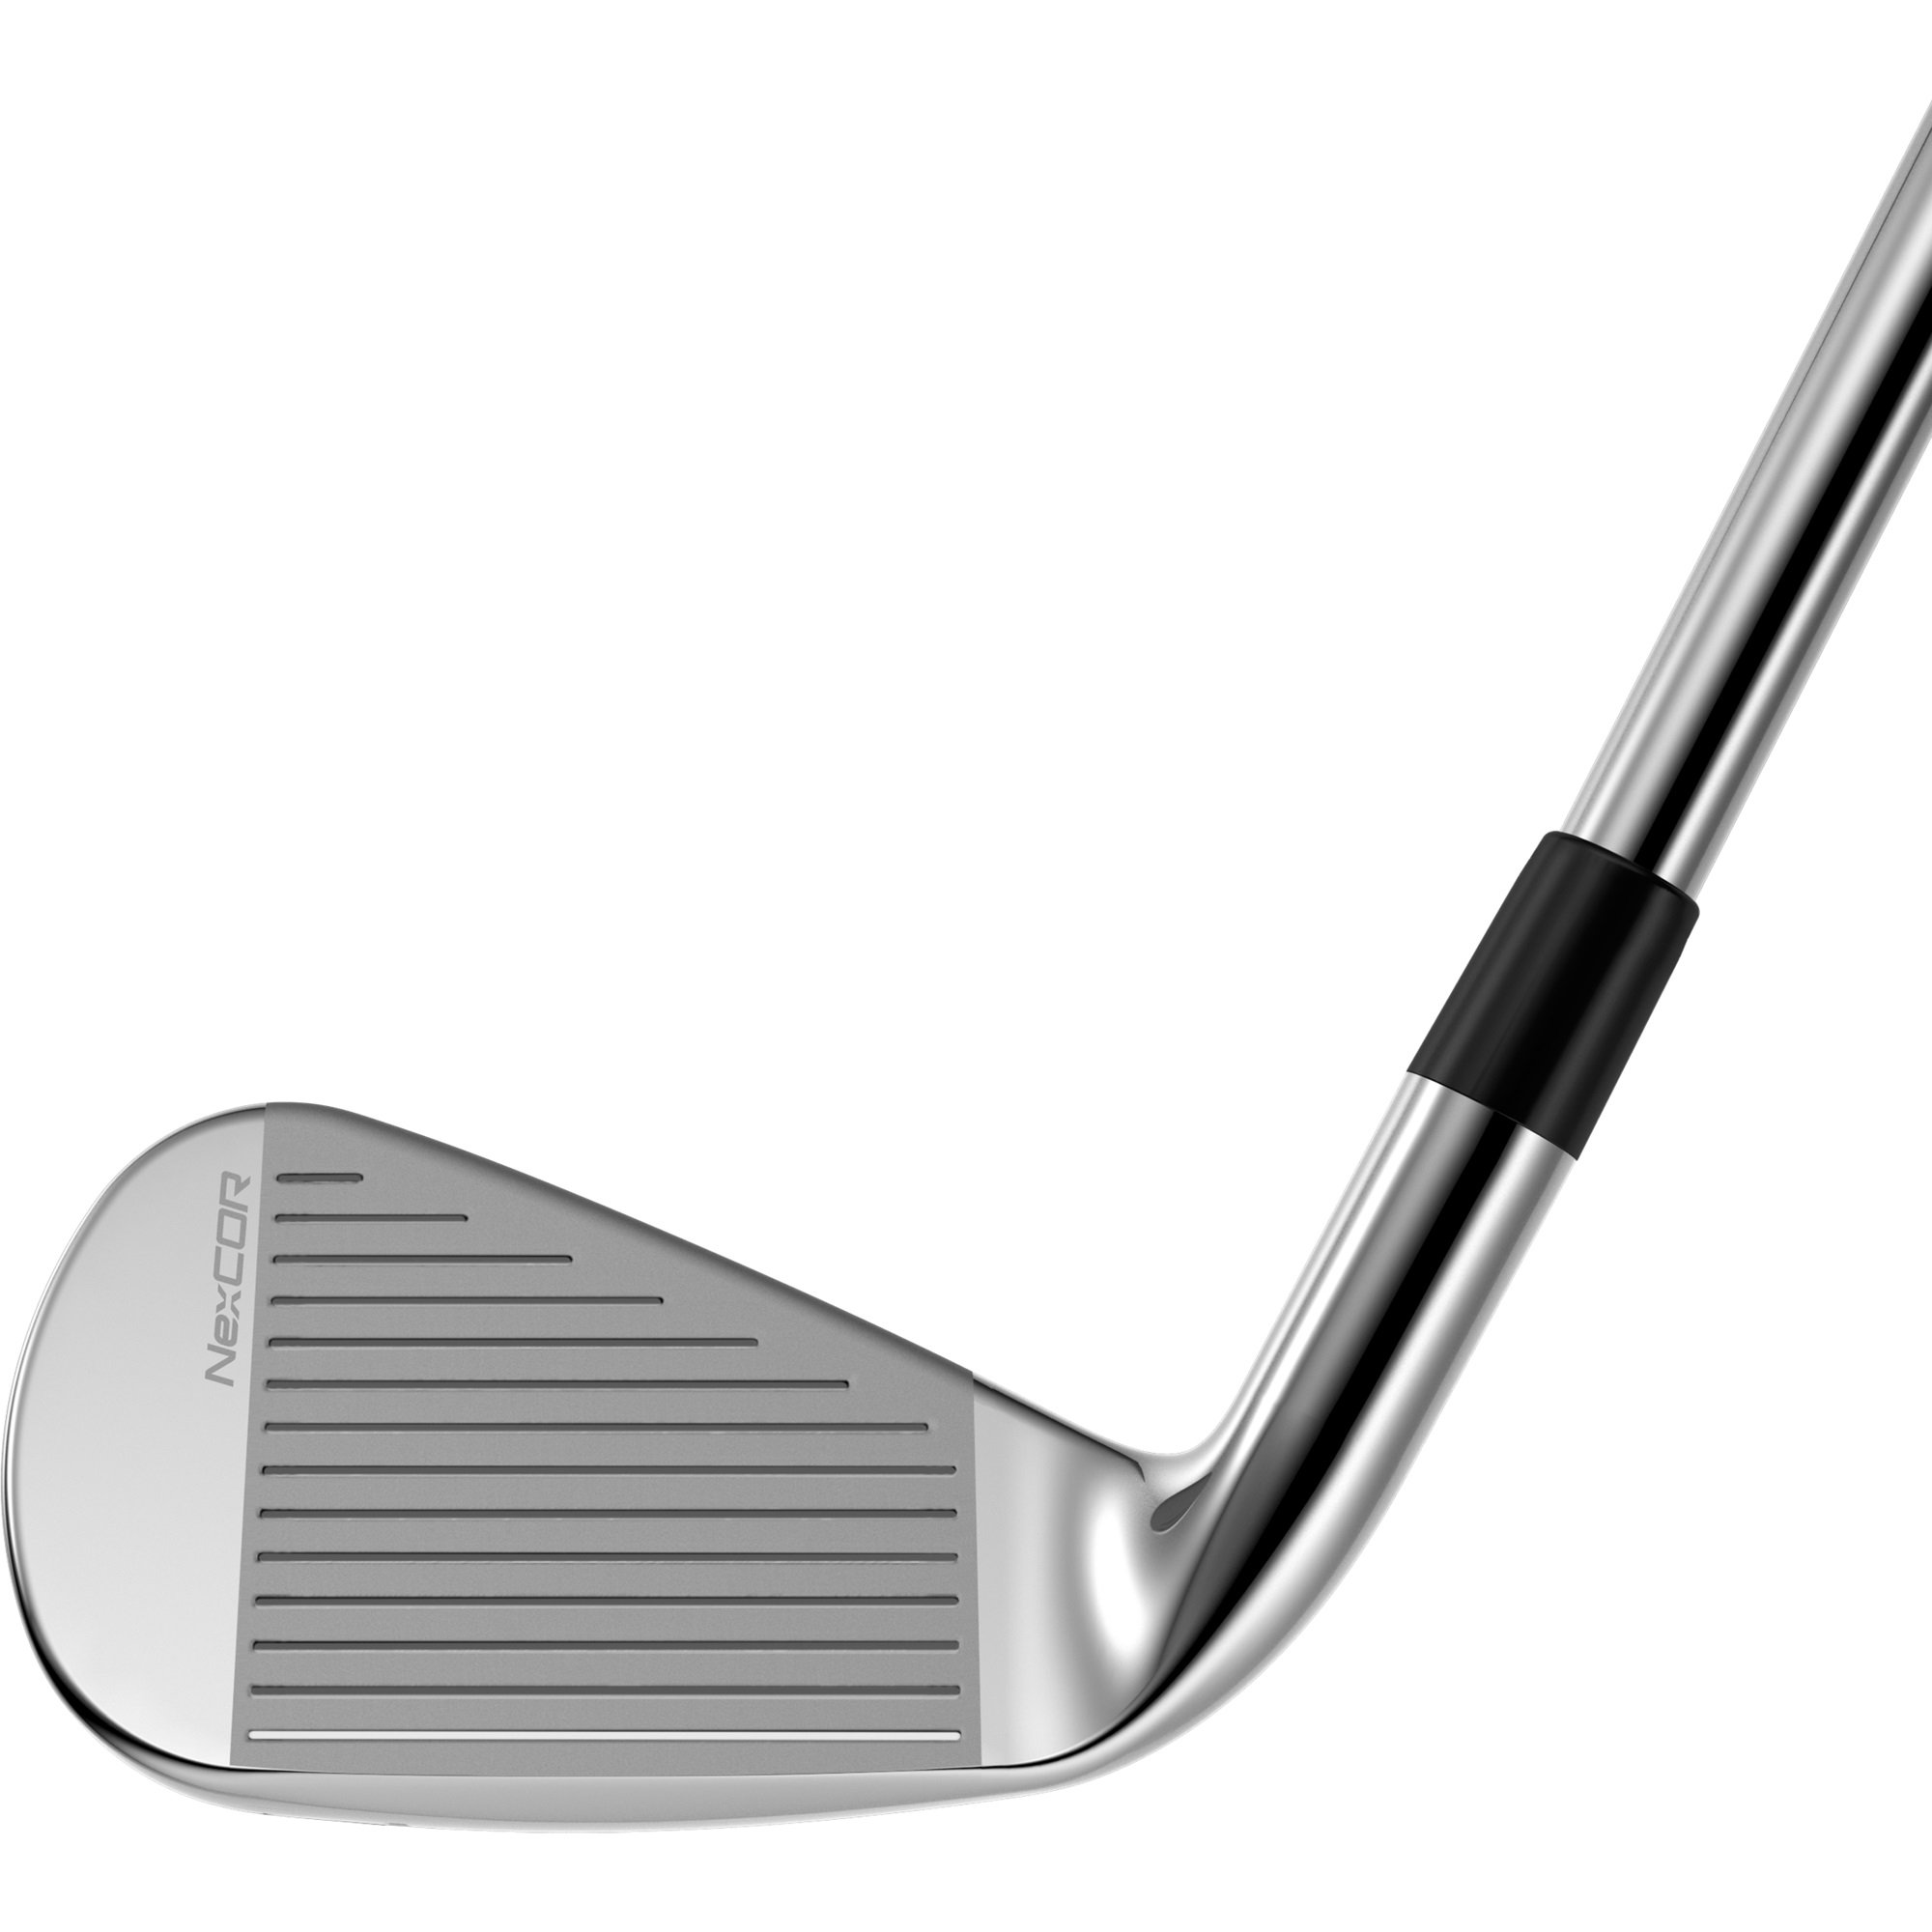 Nike Golf Men's VRS Covert 2.0 Cast Golf Irons Set, Right Hand, Steel, Regular by Nike Golf (Image #3)